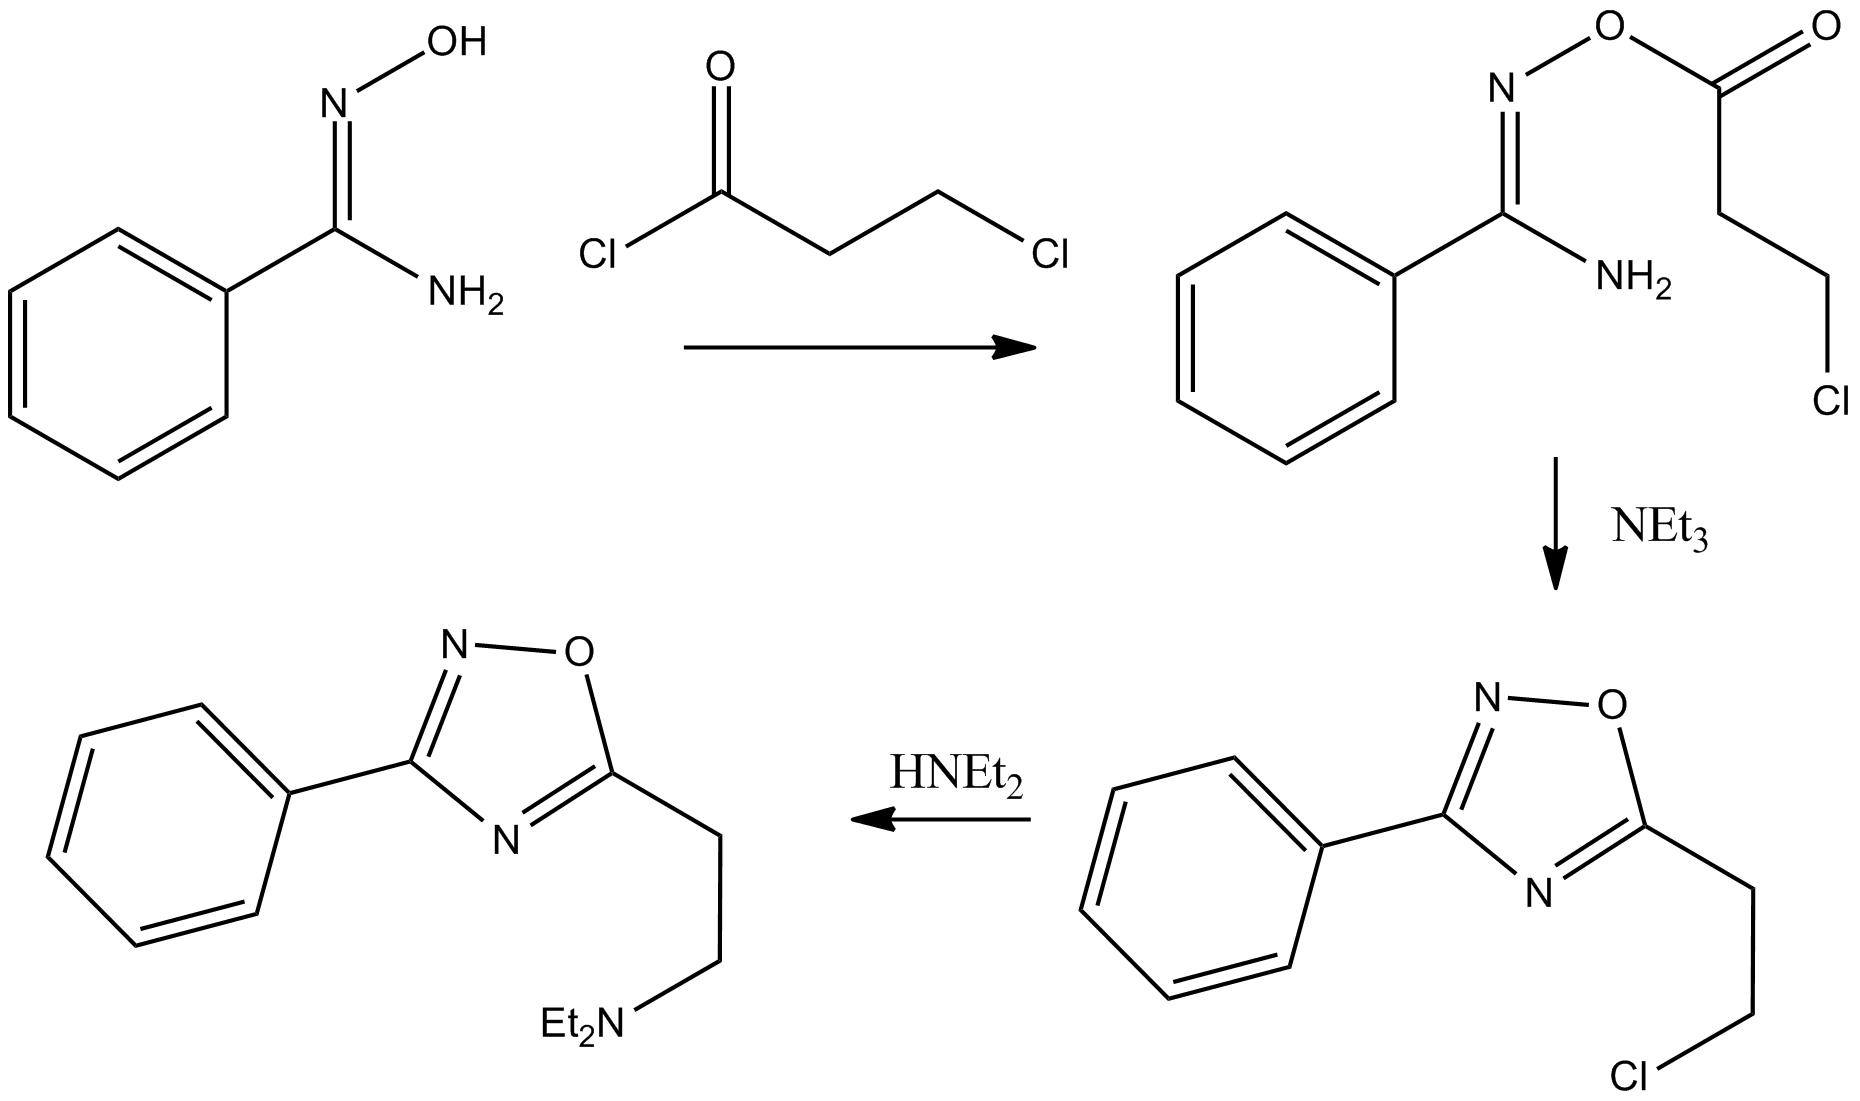 Fileoxolamine Rxn Scheme Wikimedia Commons Design